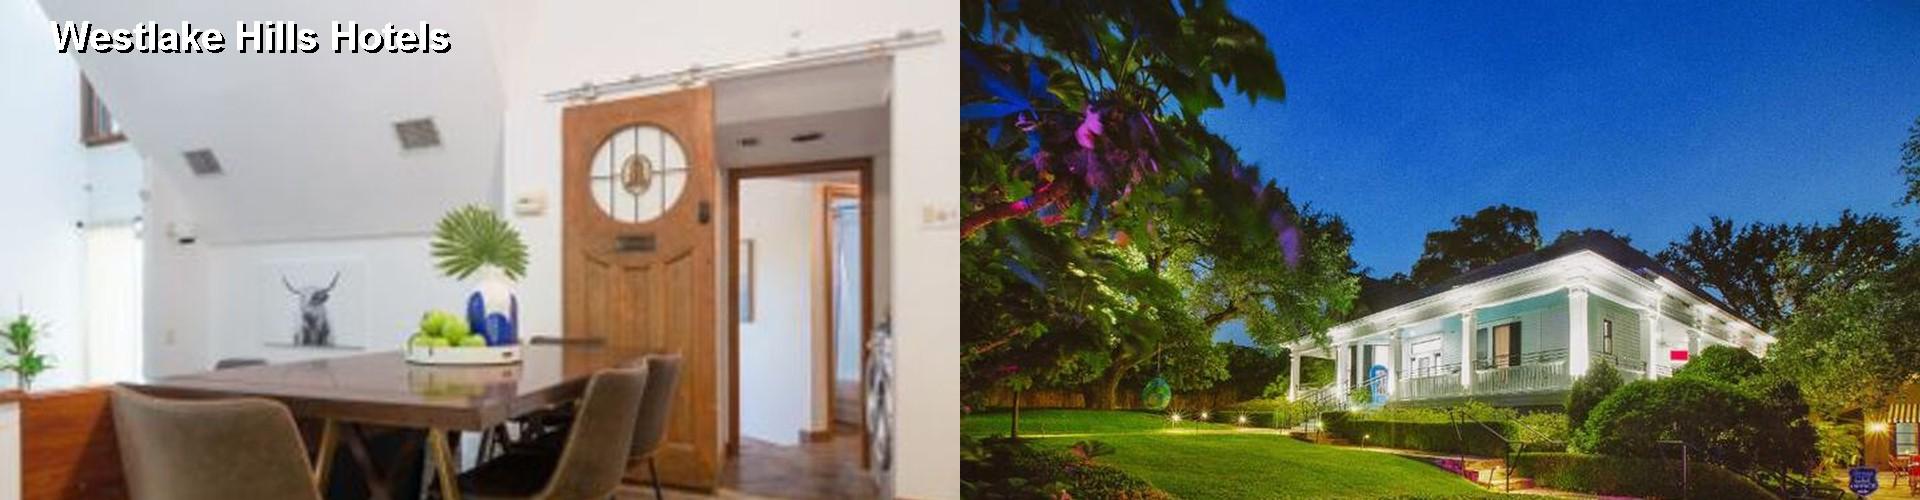 Elegant Best Hotels Near Westlake Hills With 6th Street Austin Tx